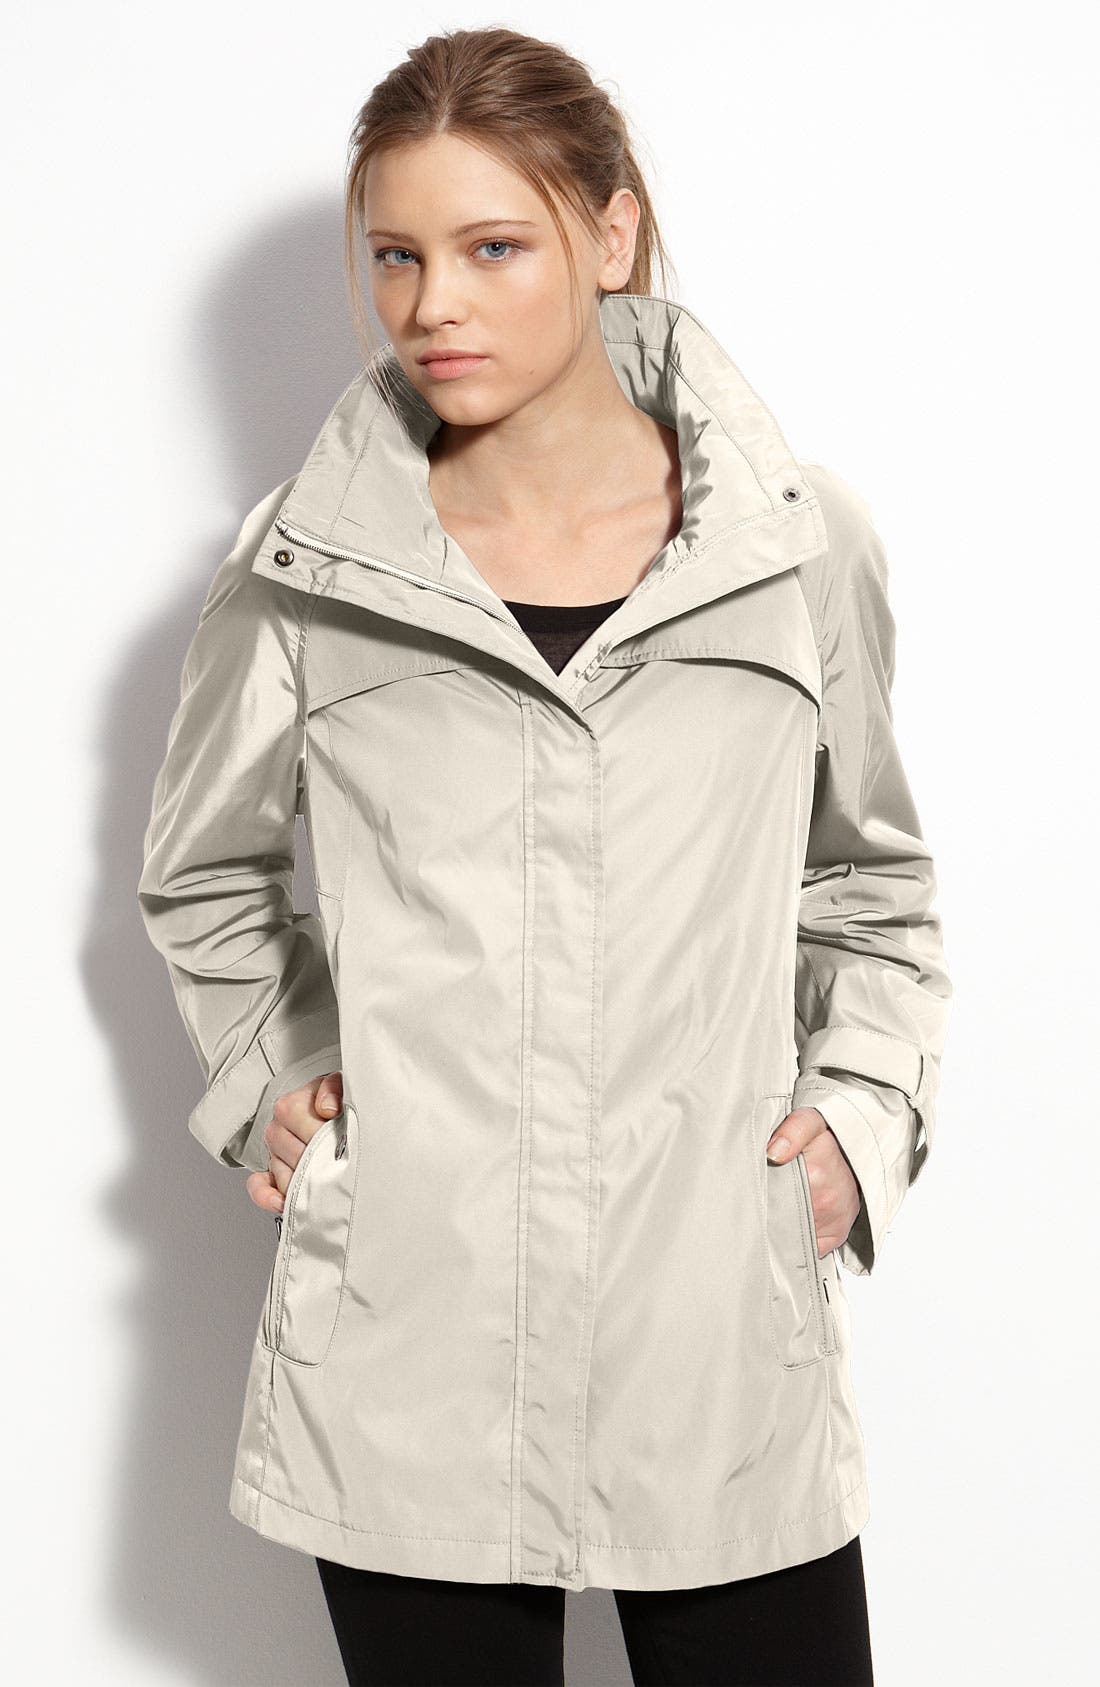 Alternate Image 1 Selected - Platinum Utex Weatherproof Jacket